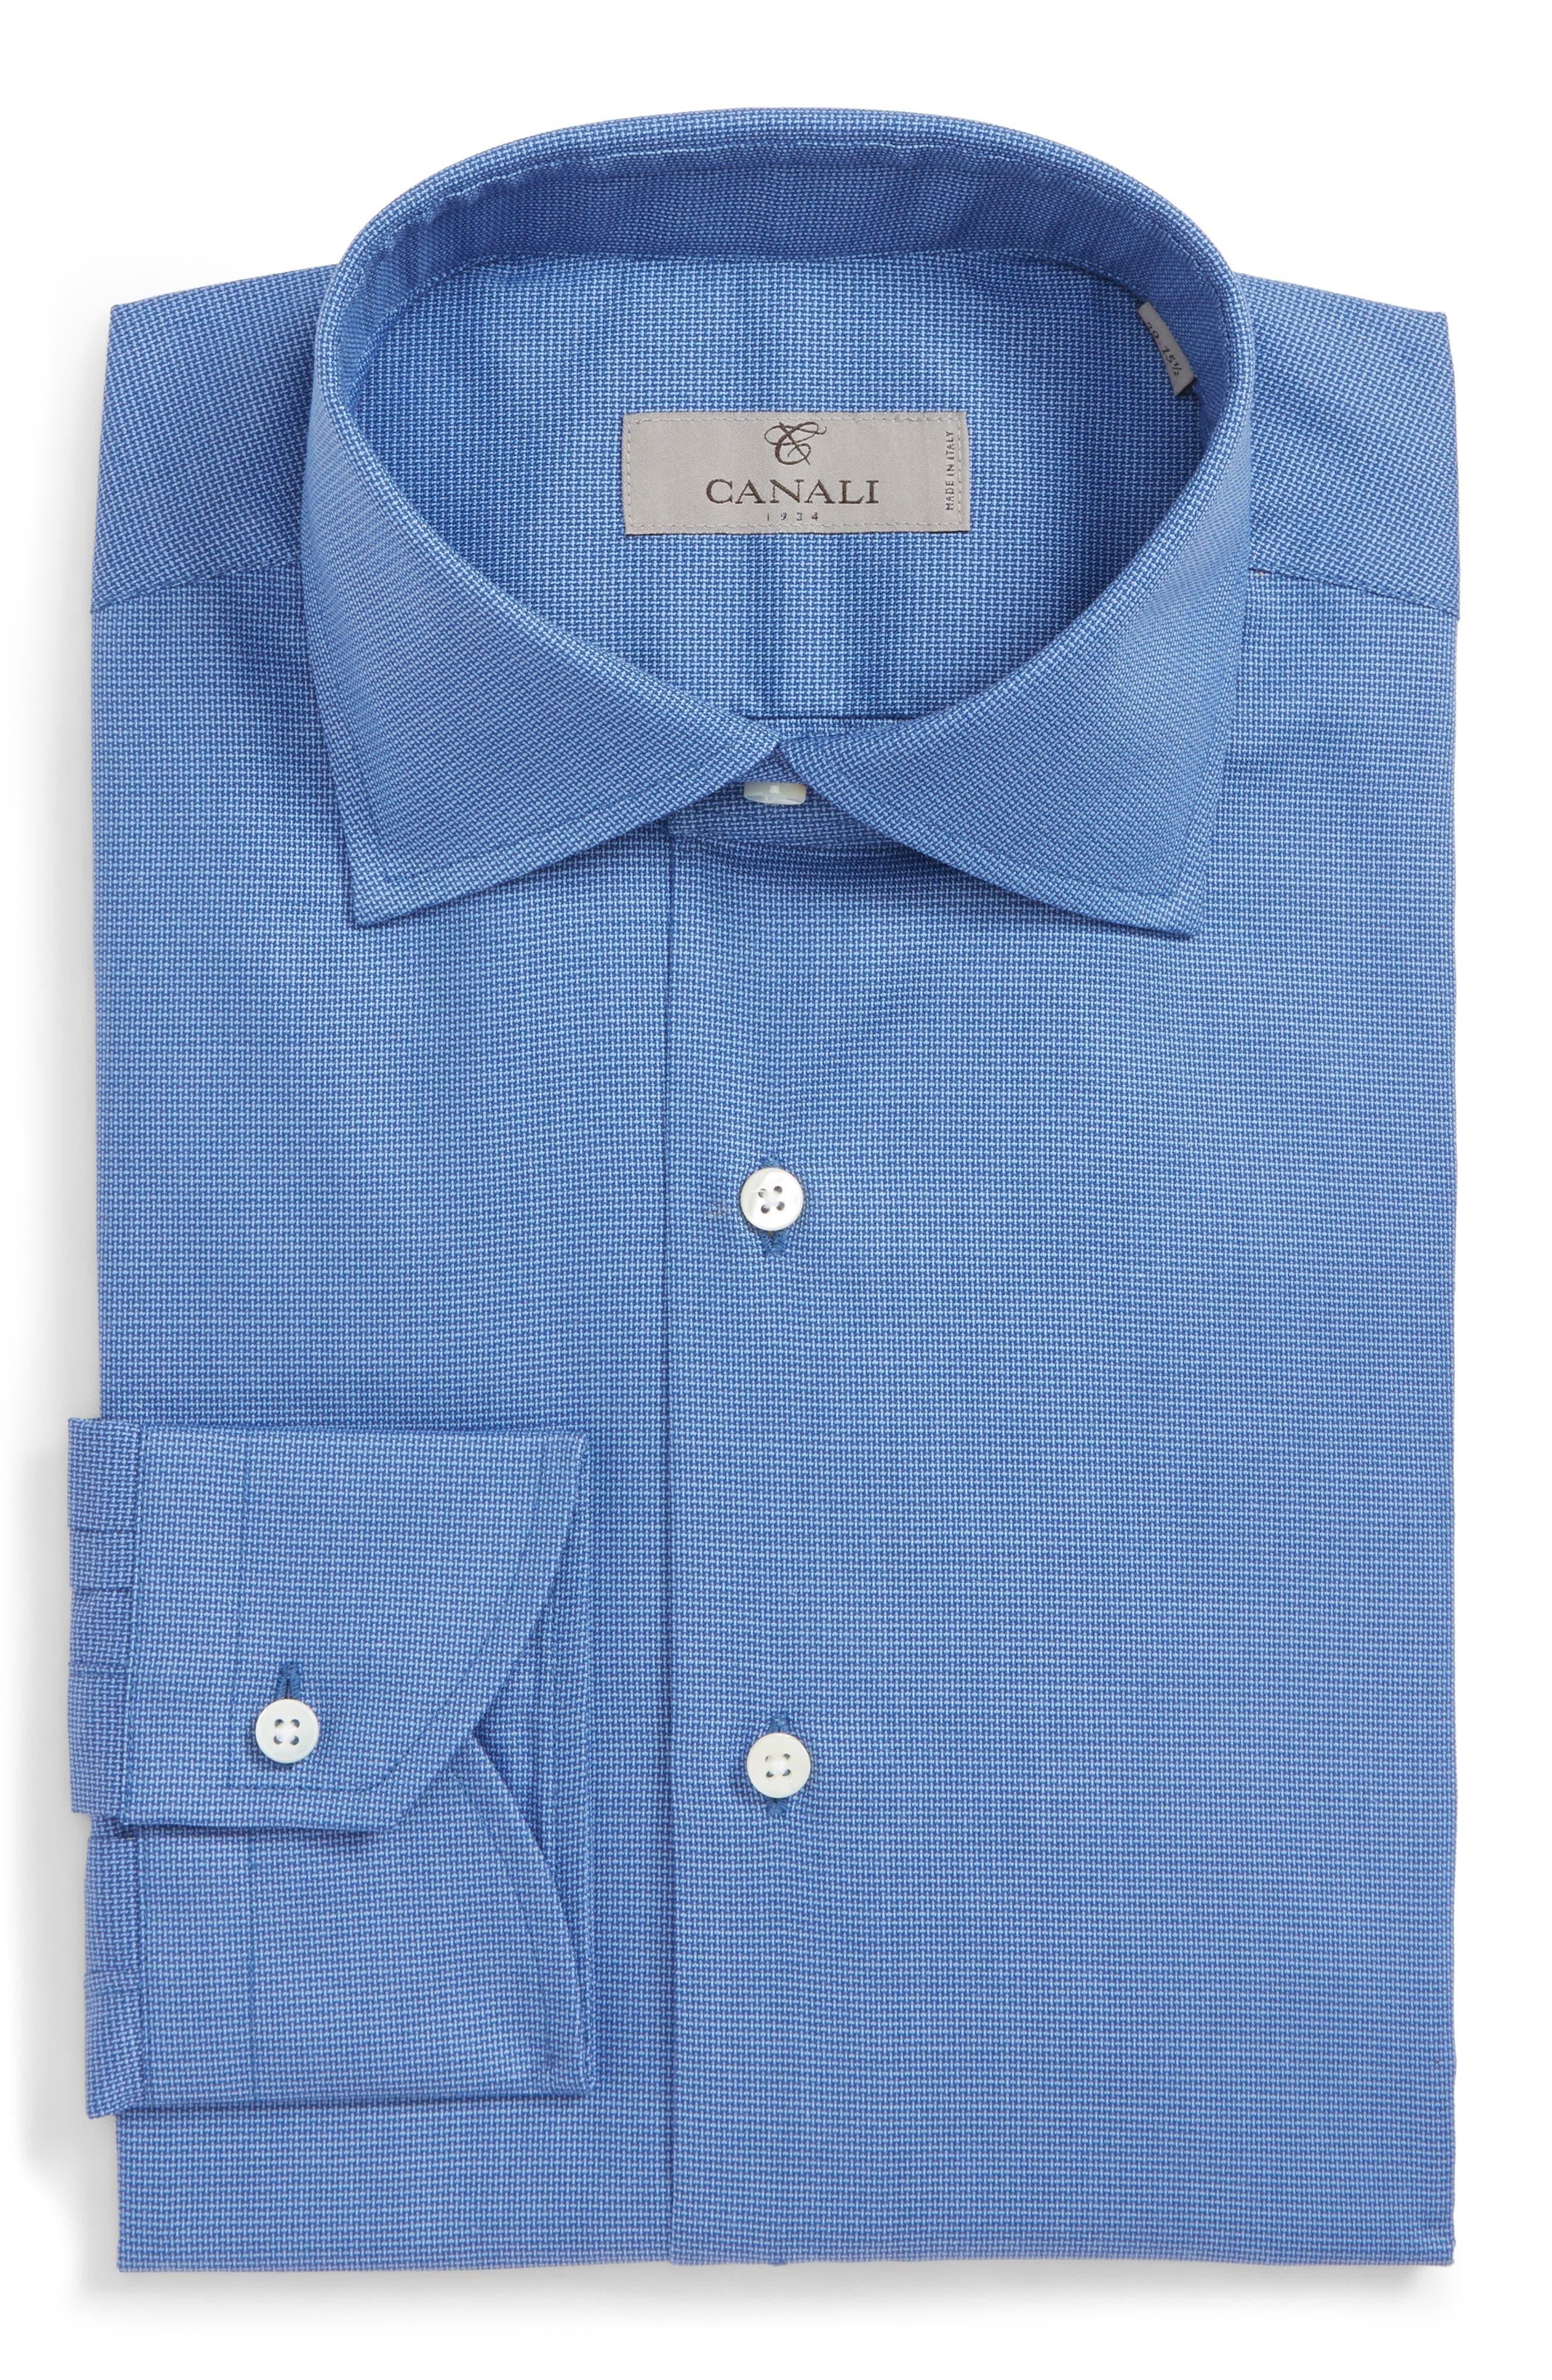 Regular Fit Dress Shirt,                             Alternate thumbnail 6, color,                             Dark Blue